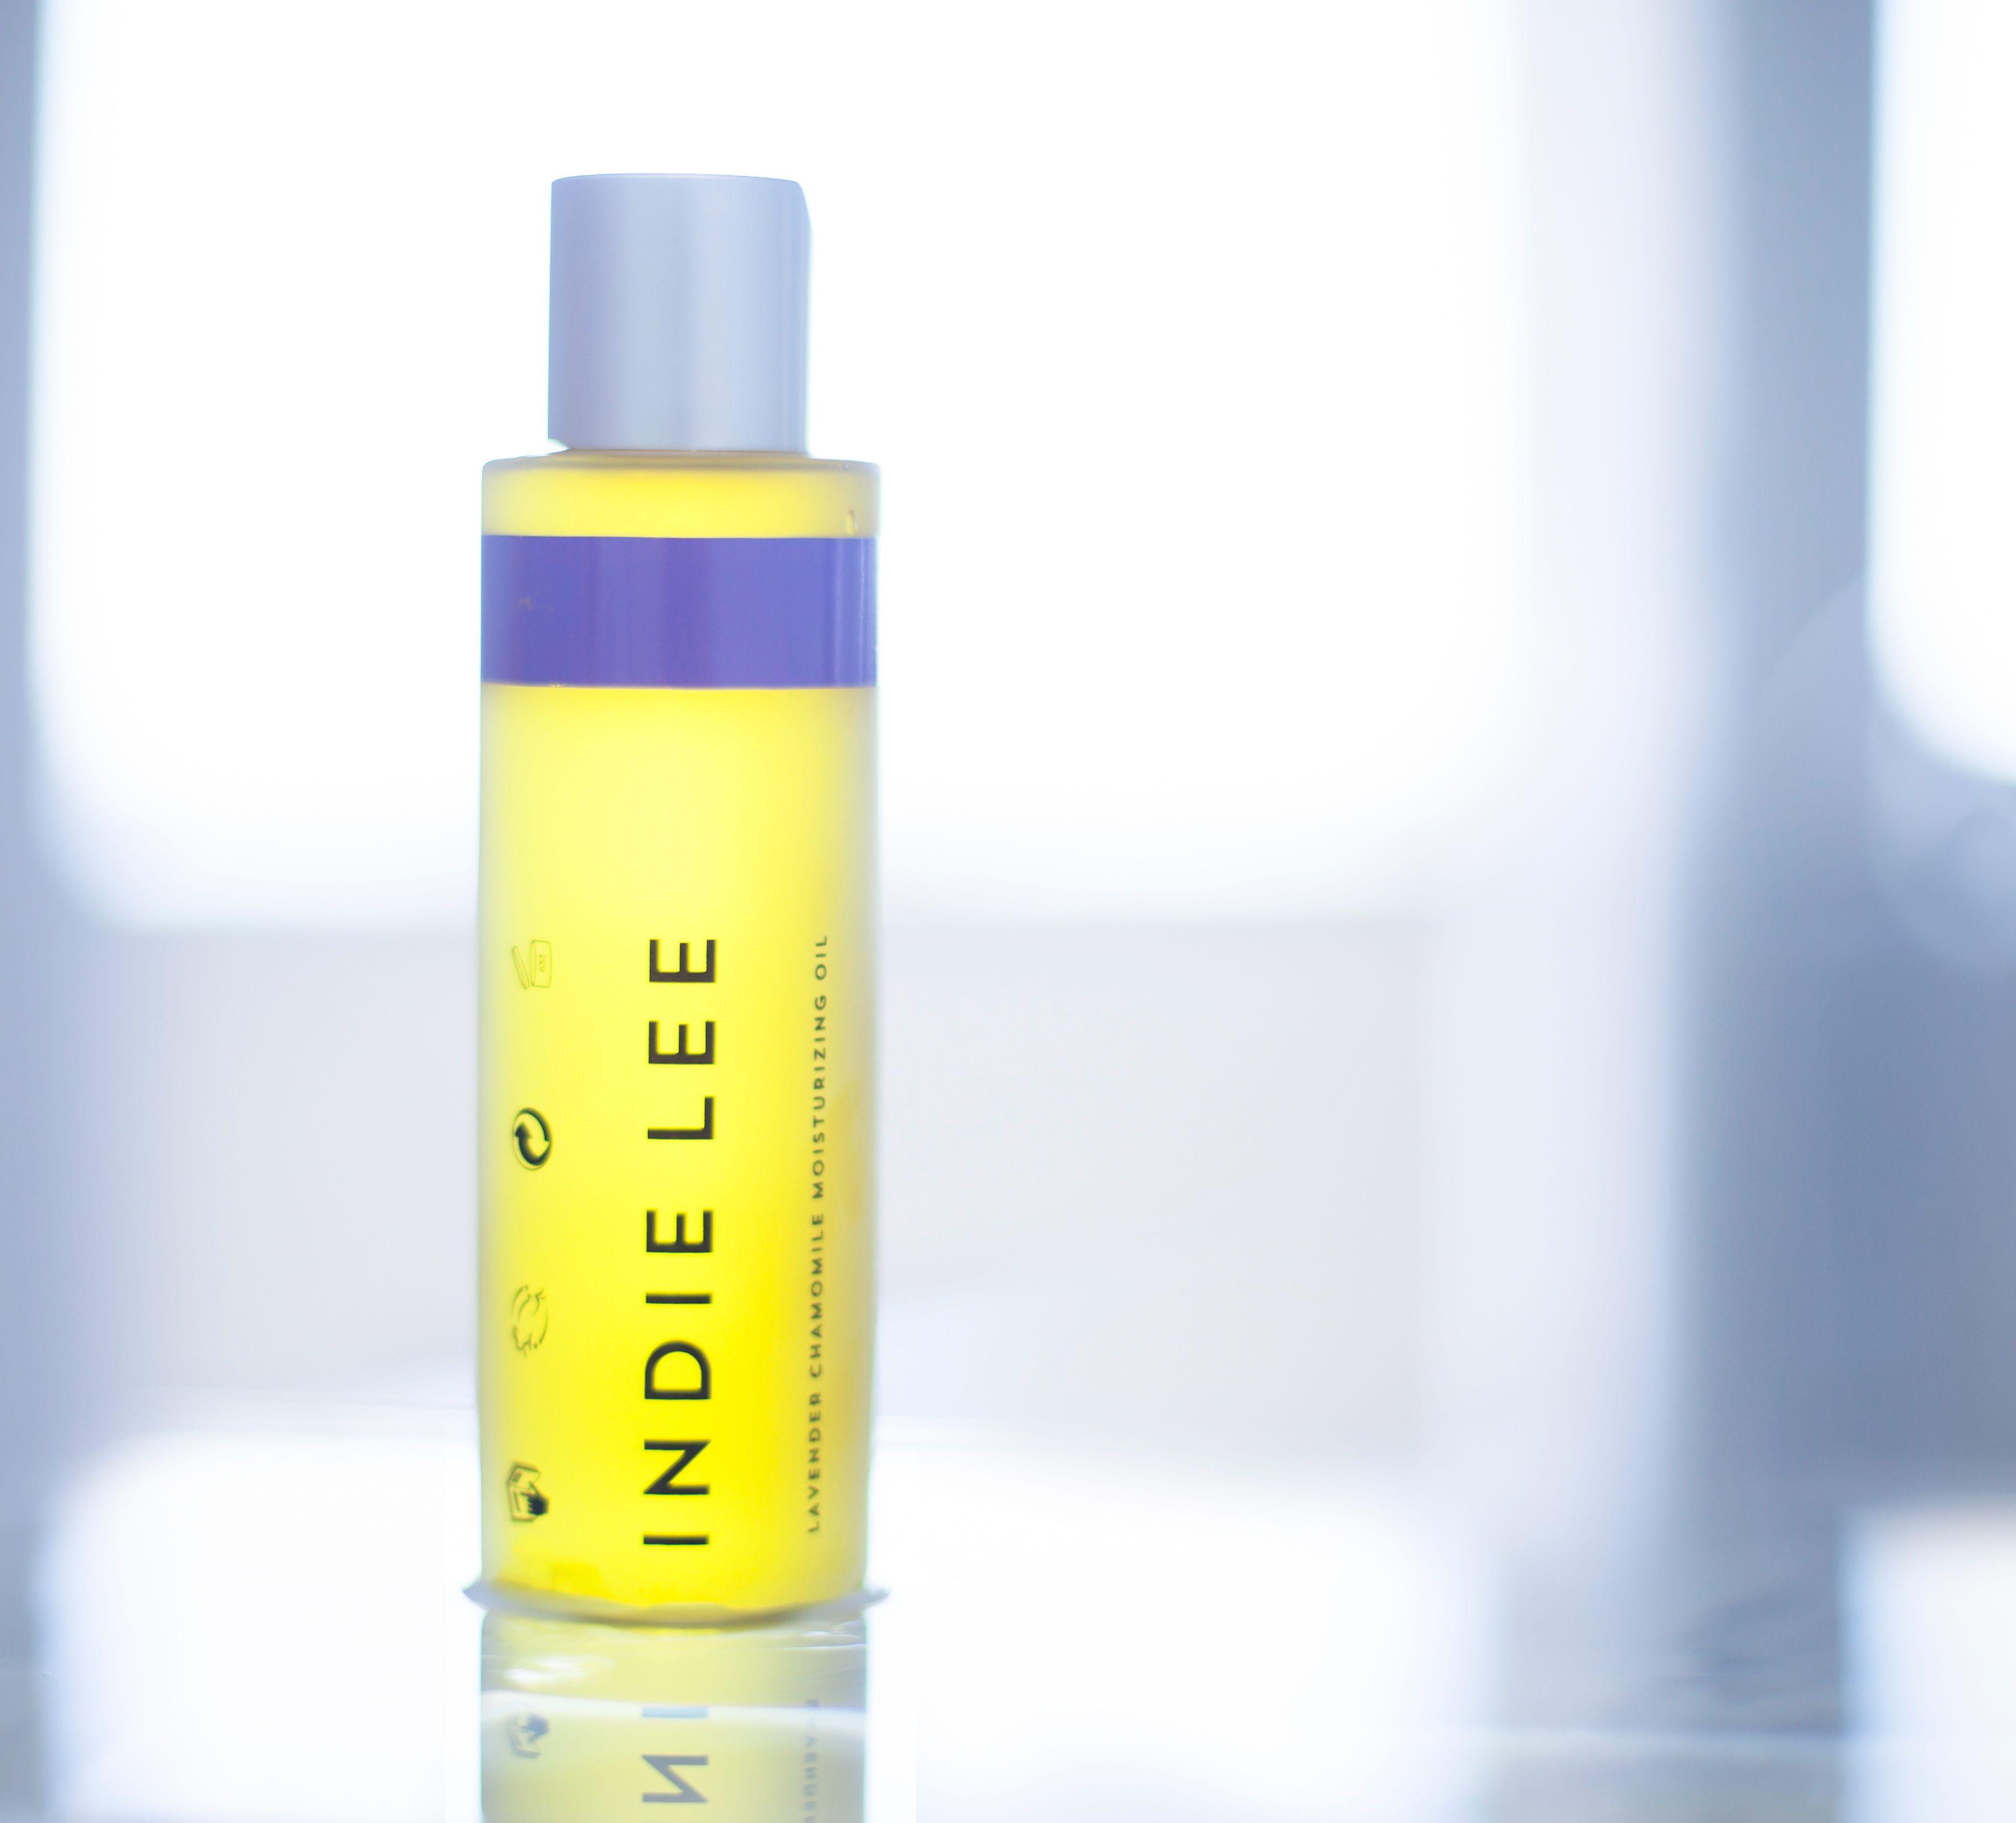 INDIE LEE LAVENDER CHAMOMILE MOISTURIZING OIL IndieLee